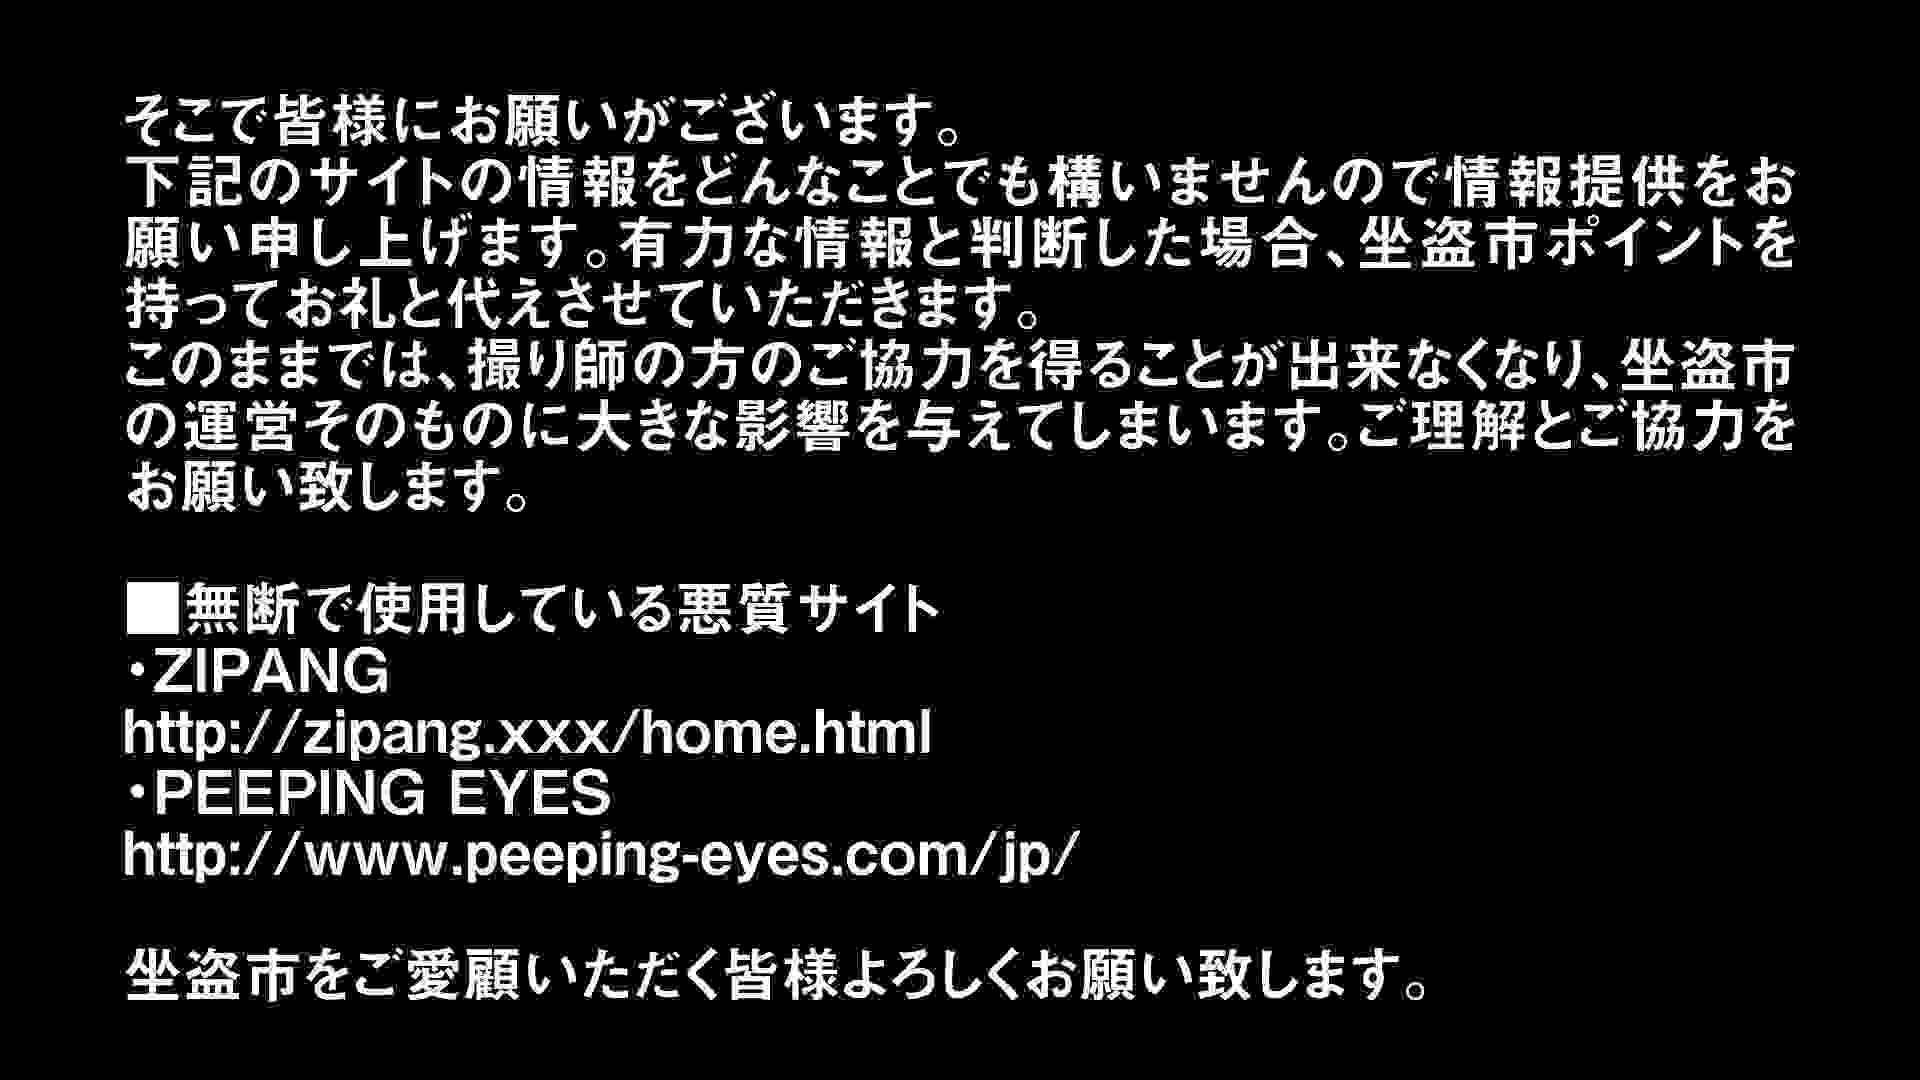 Aquaな露天風呂Vol.301 OLセックス 隠し撮りすけべAV動画紹介 85画像 26